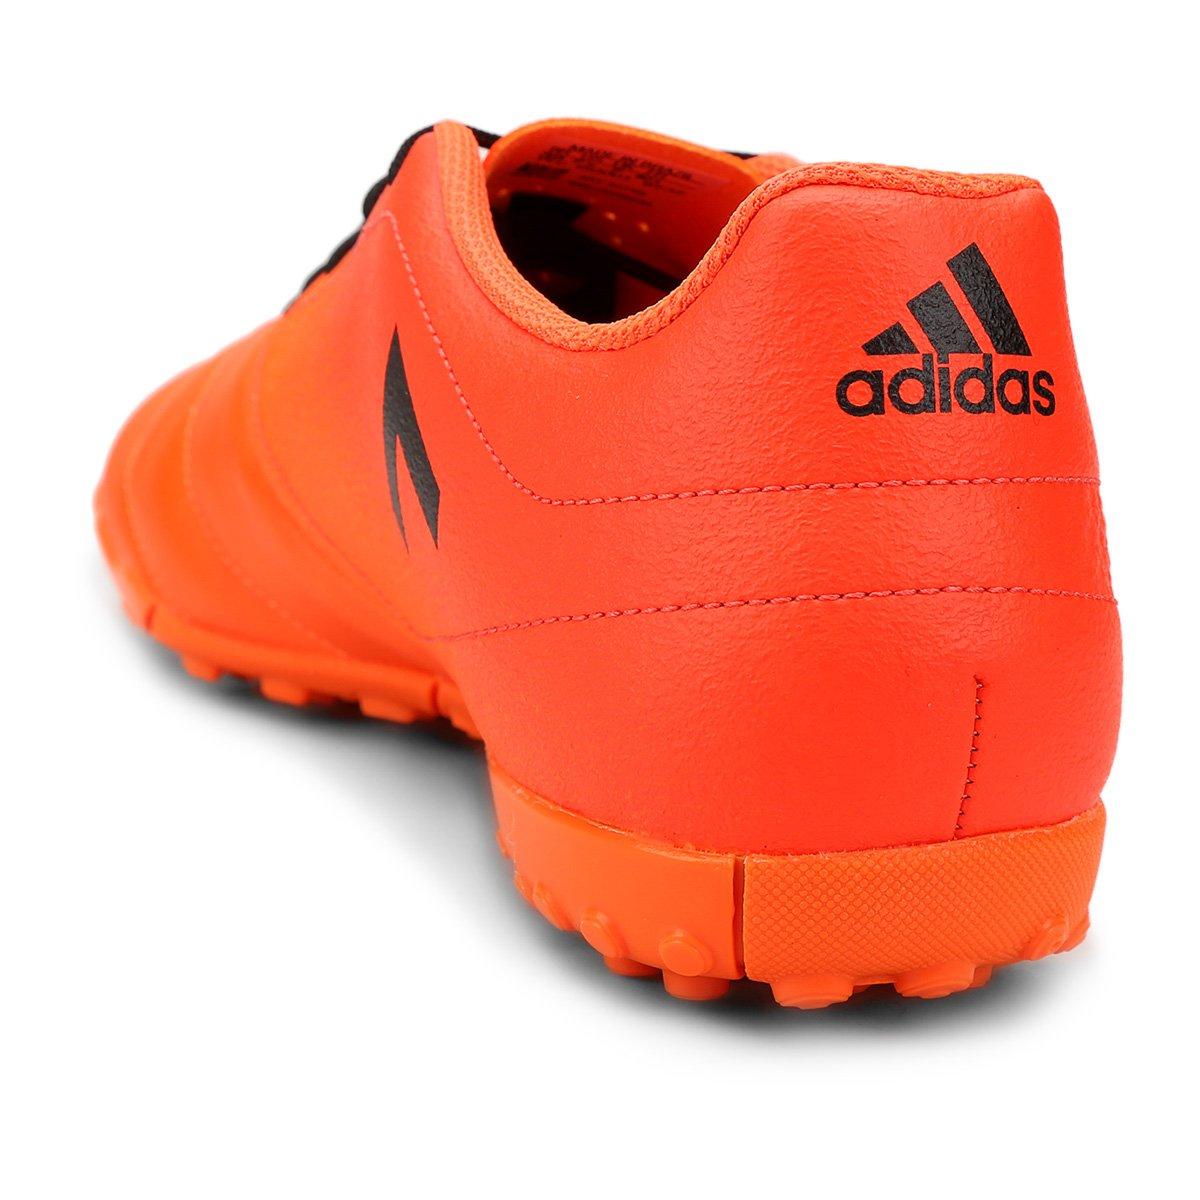 Adidas 17 Chuteira Chuteira Masculina 4 Society Laranja Society TF Ace UBptxxqnX